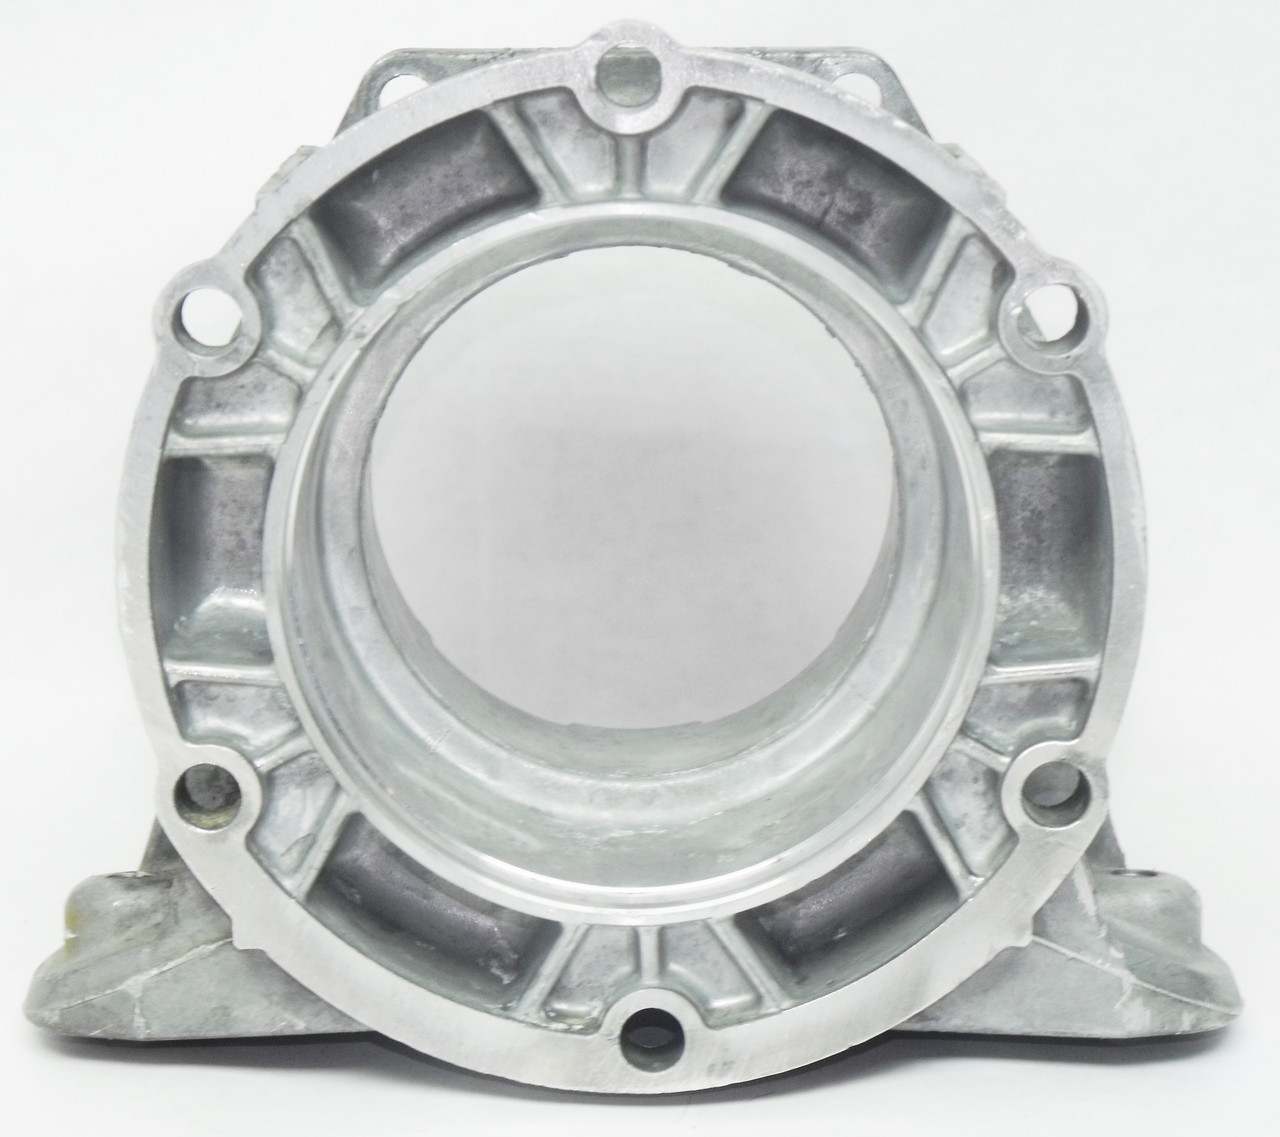 700r4 4l60e 4l65e Valve Bodies Gm Transmission Parts - Year